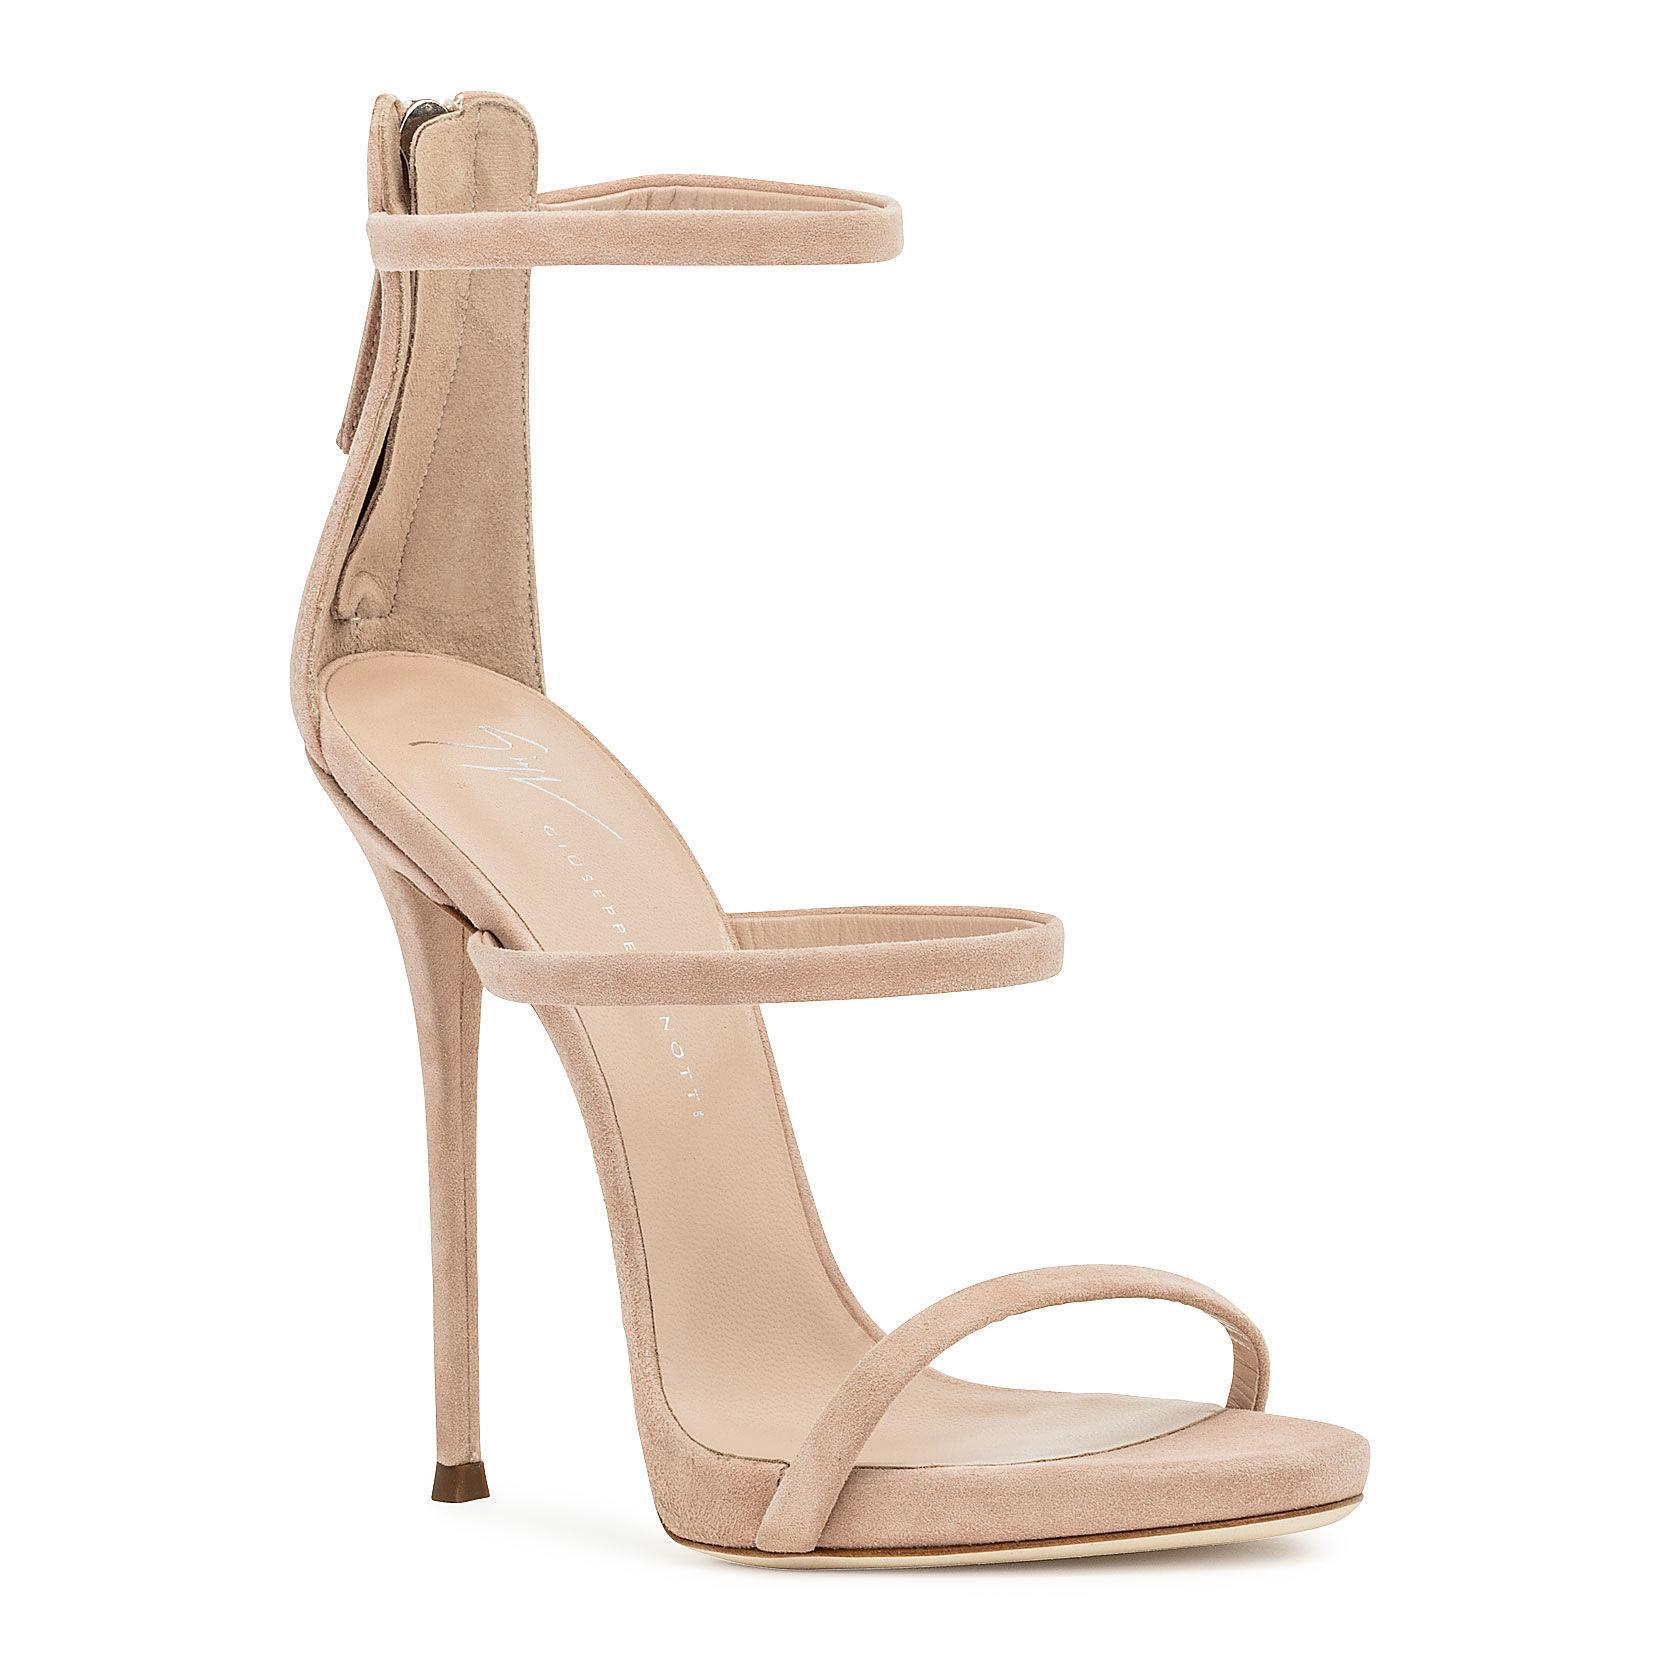 bd99b69a60b63 Giuseppe Zanotti. Women's Harmony Blush Suede Sandals